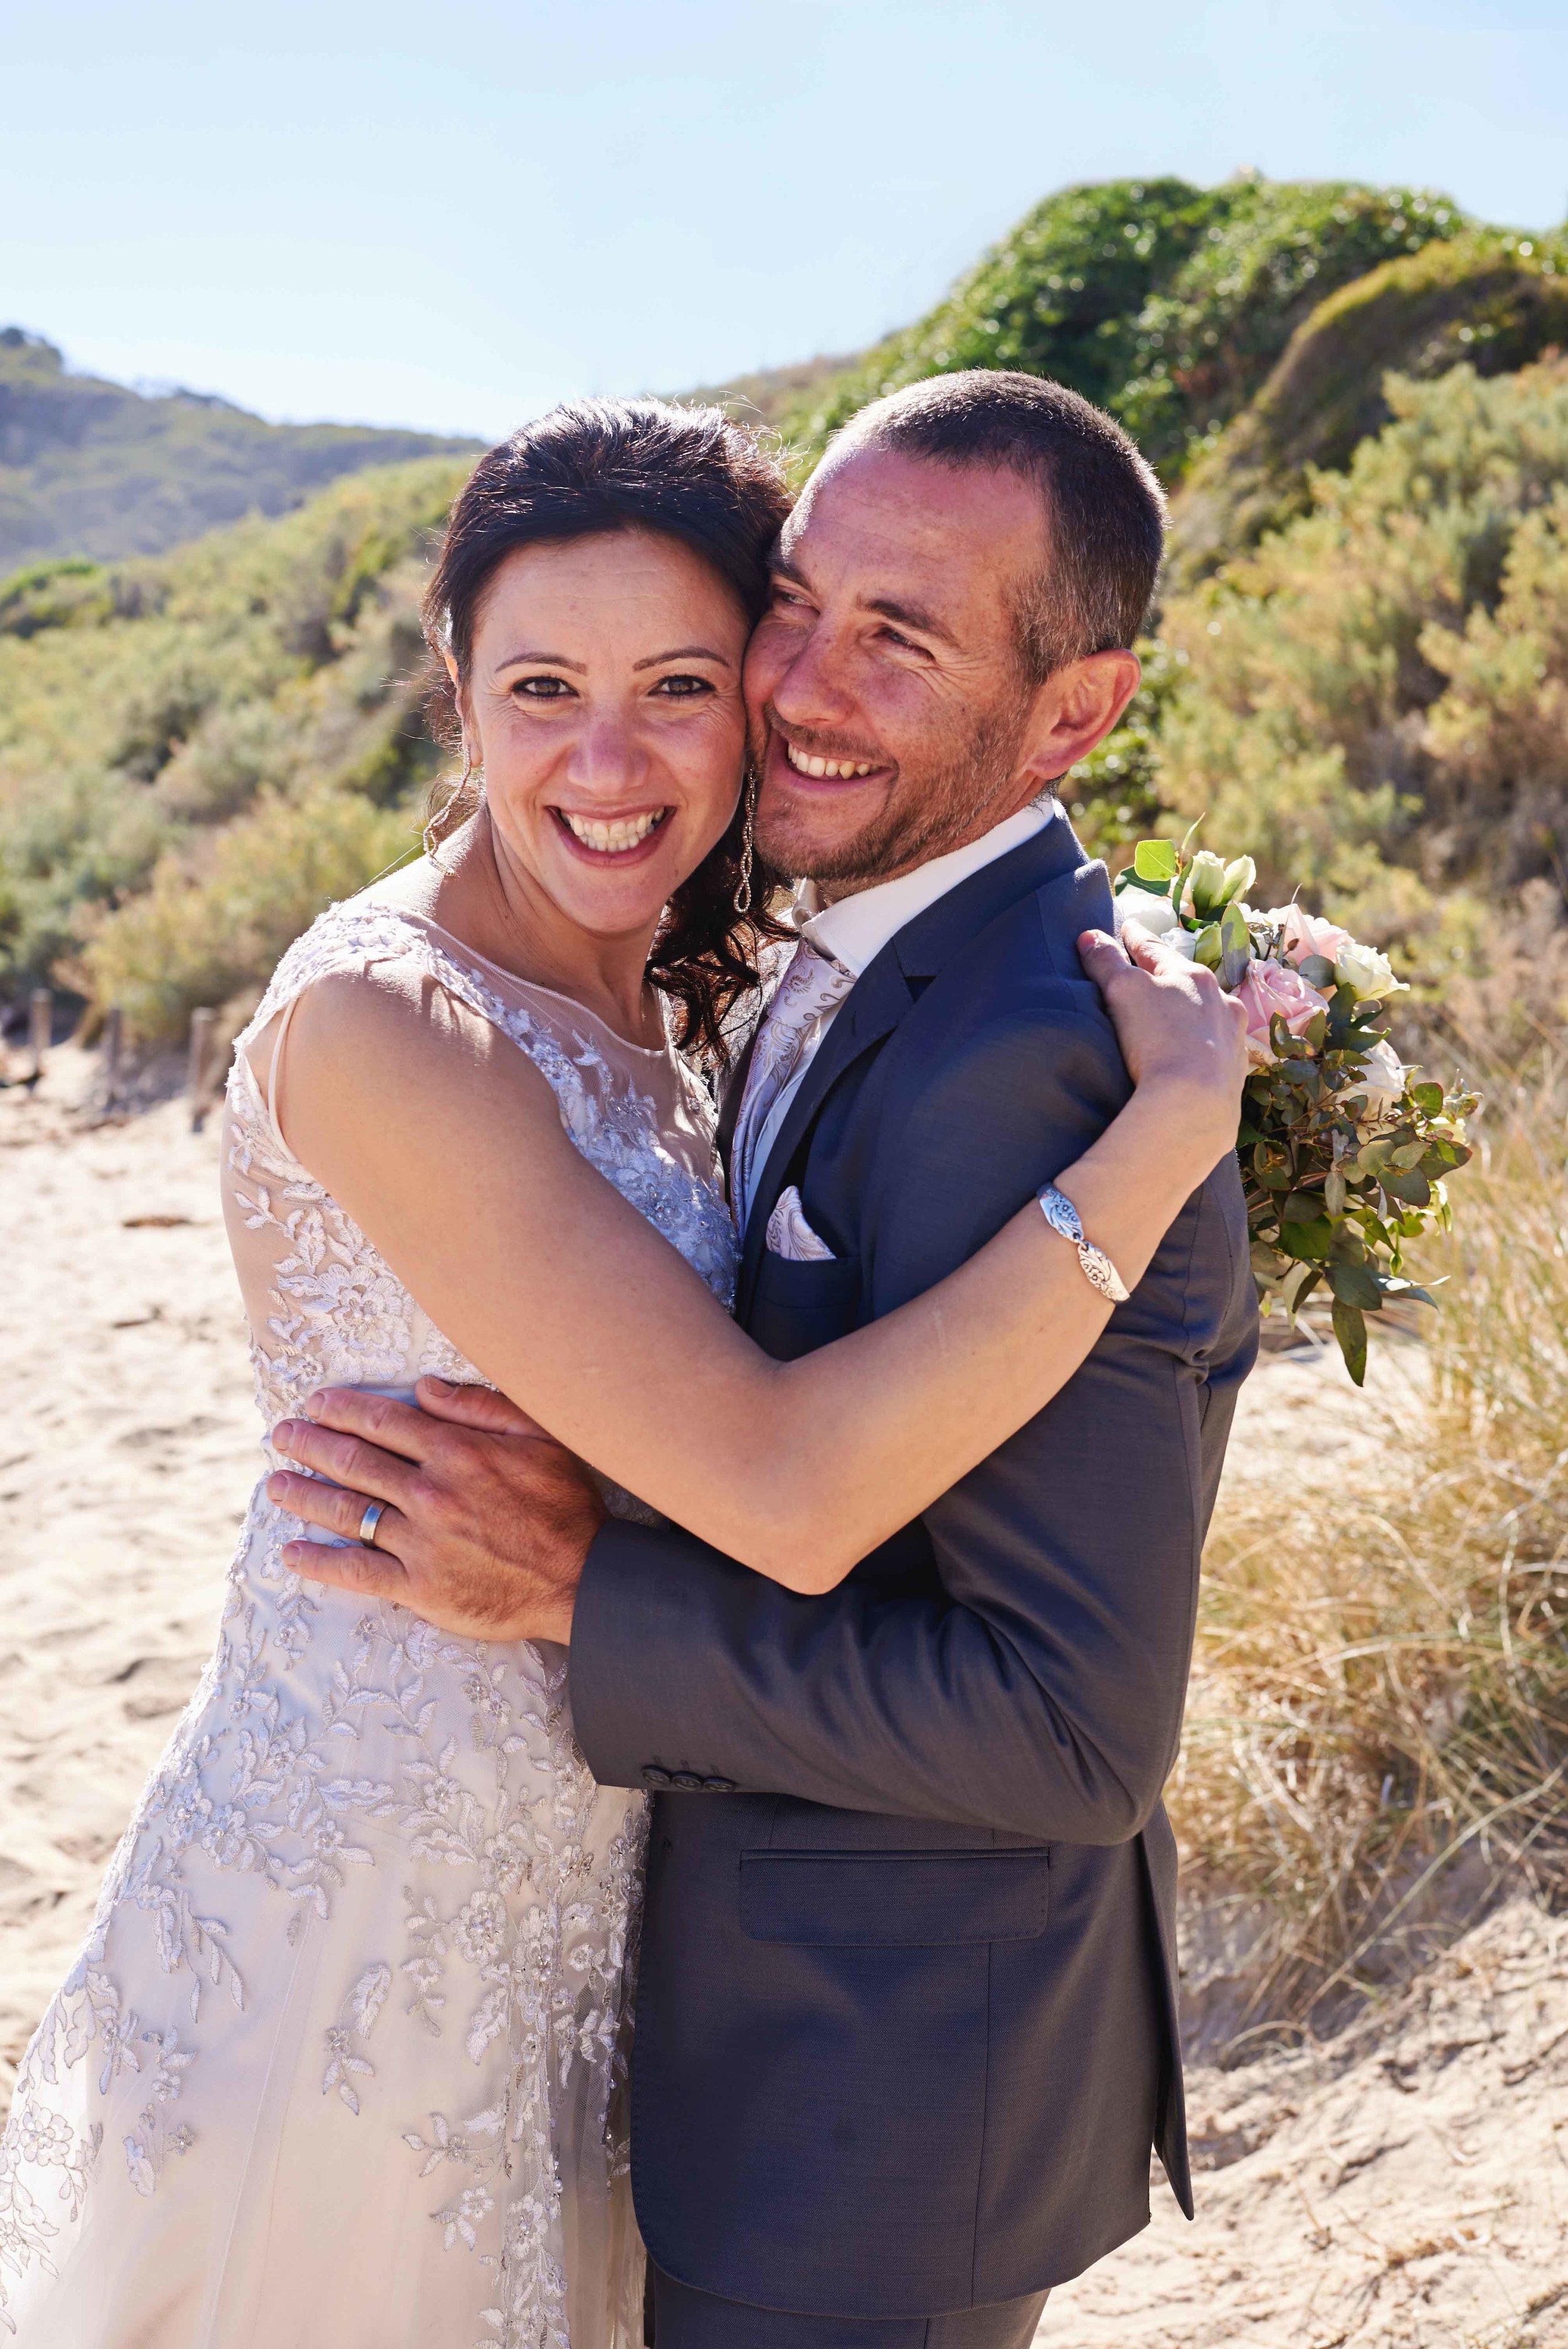 sorrento-wedding-photography-all-smiles-marissa-jade-photography-114.jpg